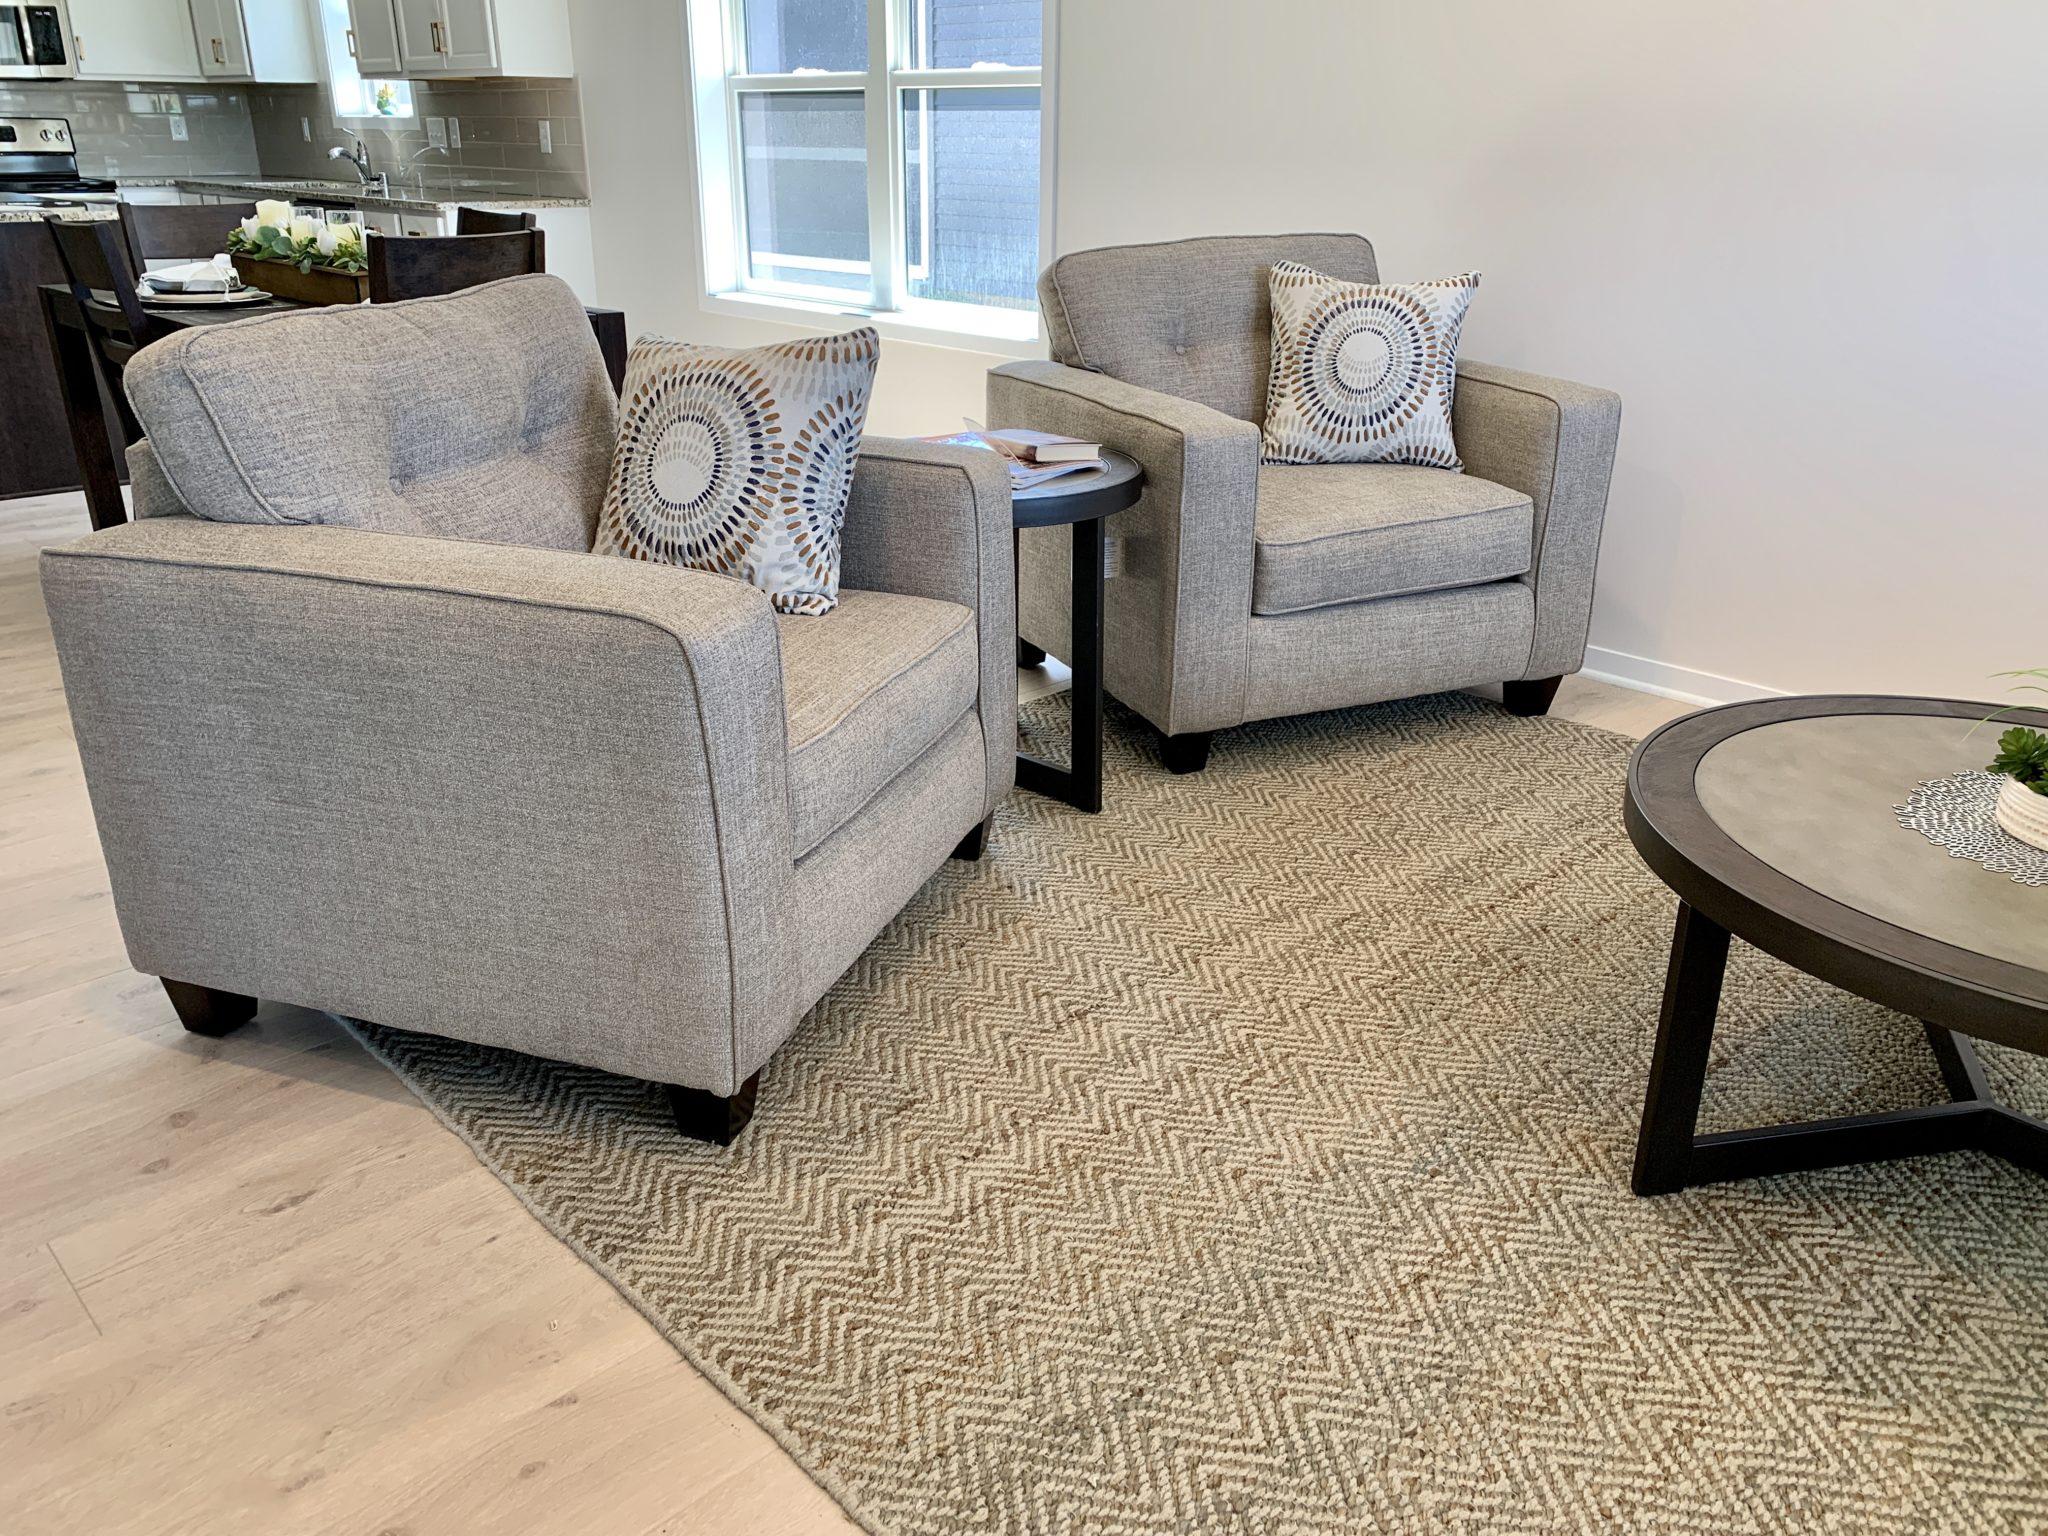 Living Room with Light Luxury Vinyl Plank Flooring